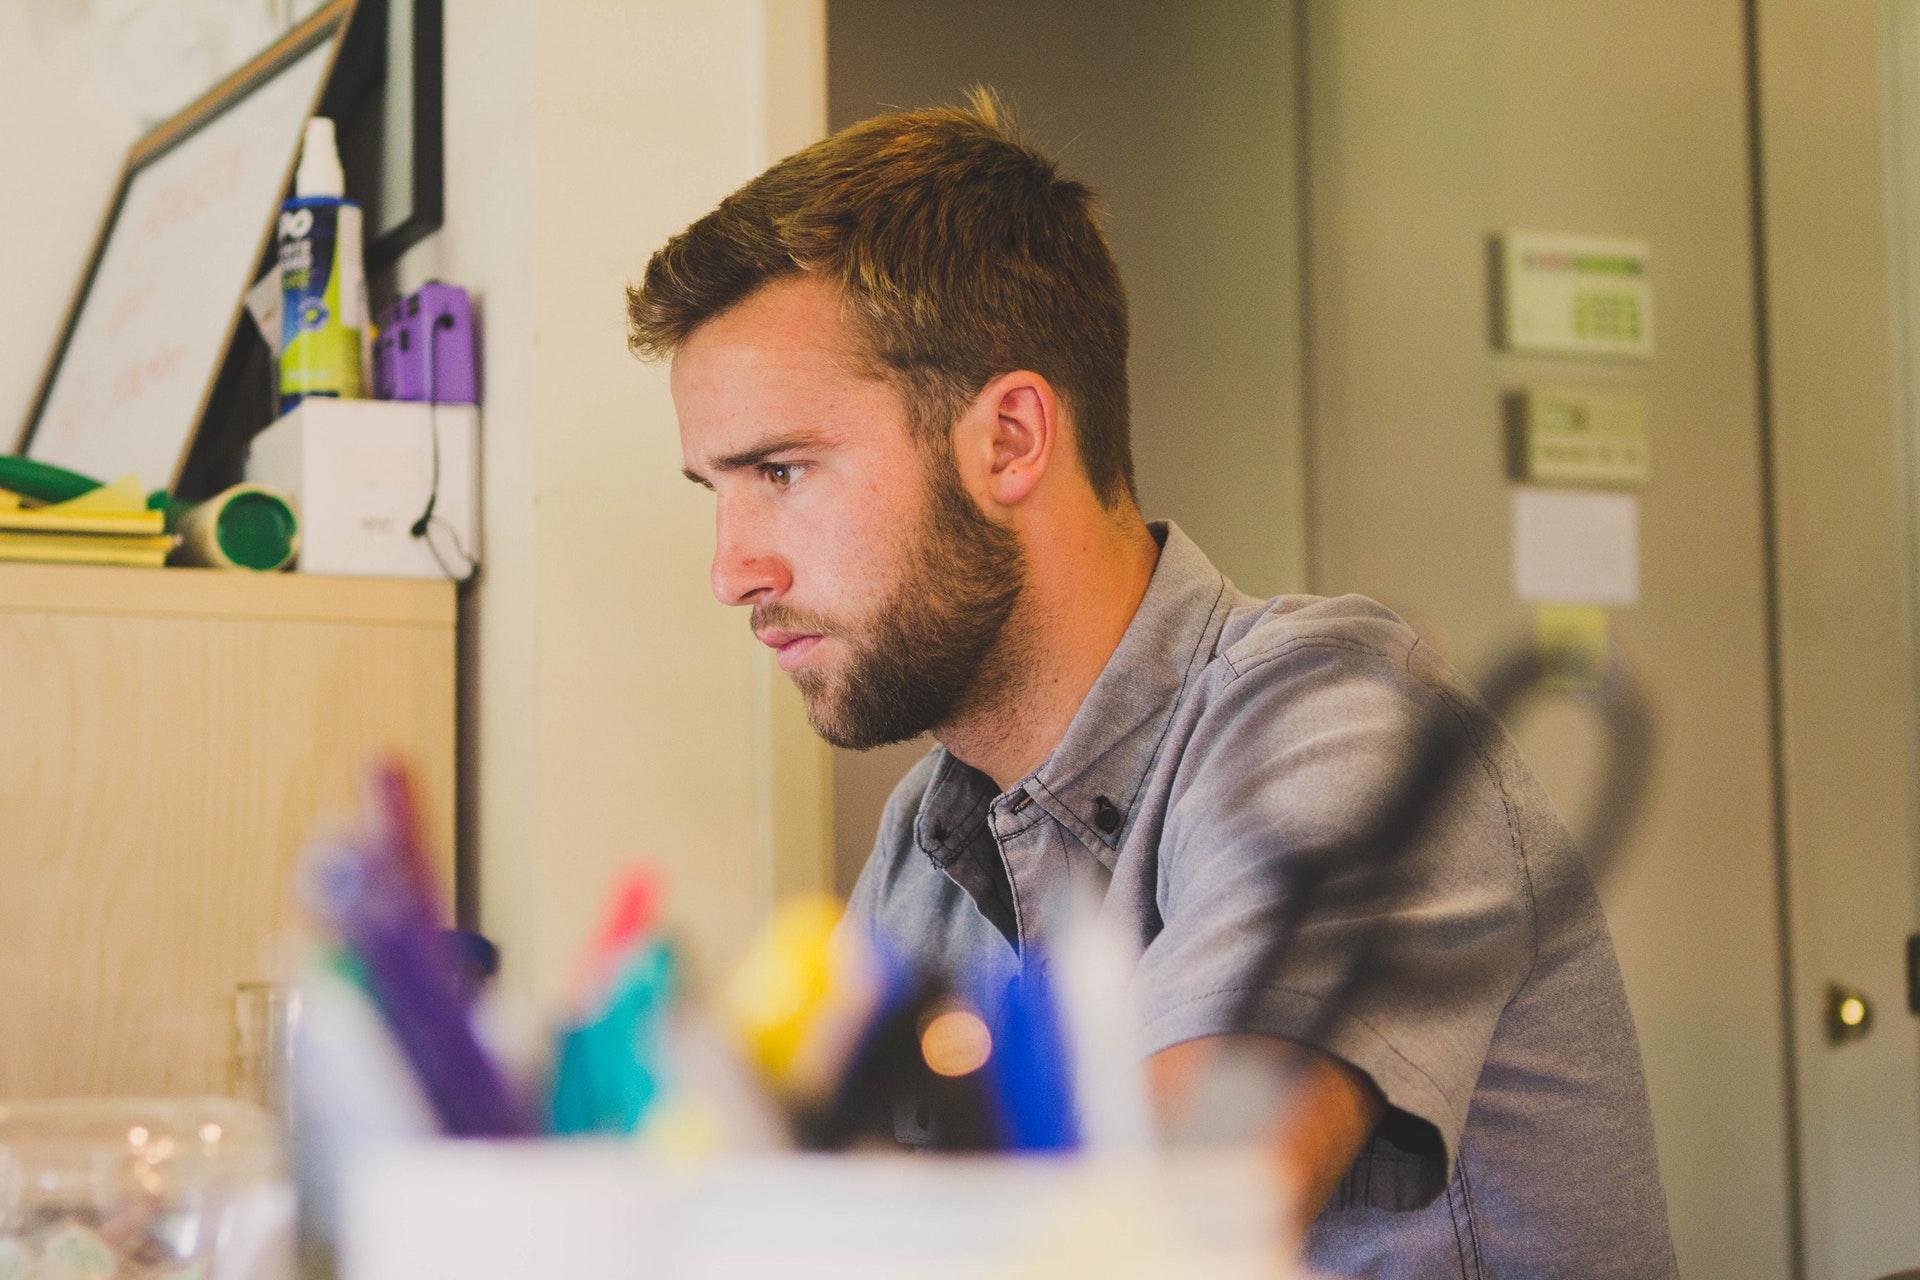 sa restartezi creierul - sfatulparintilor.ro - pexels_com - summer-office-student-work